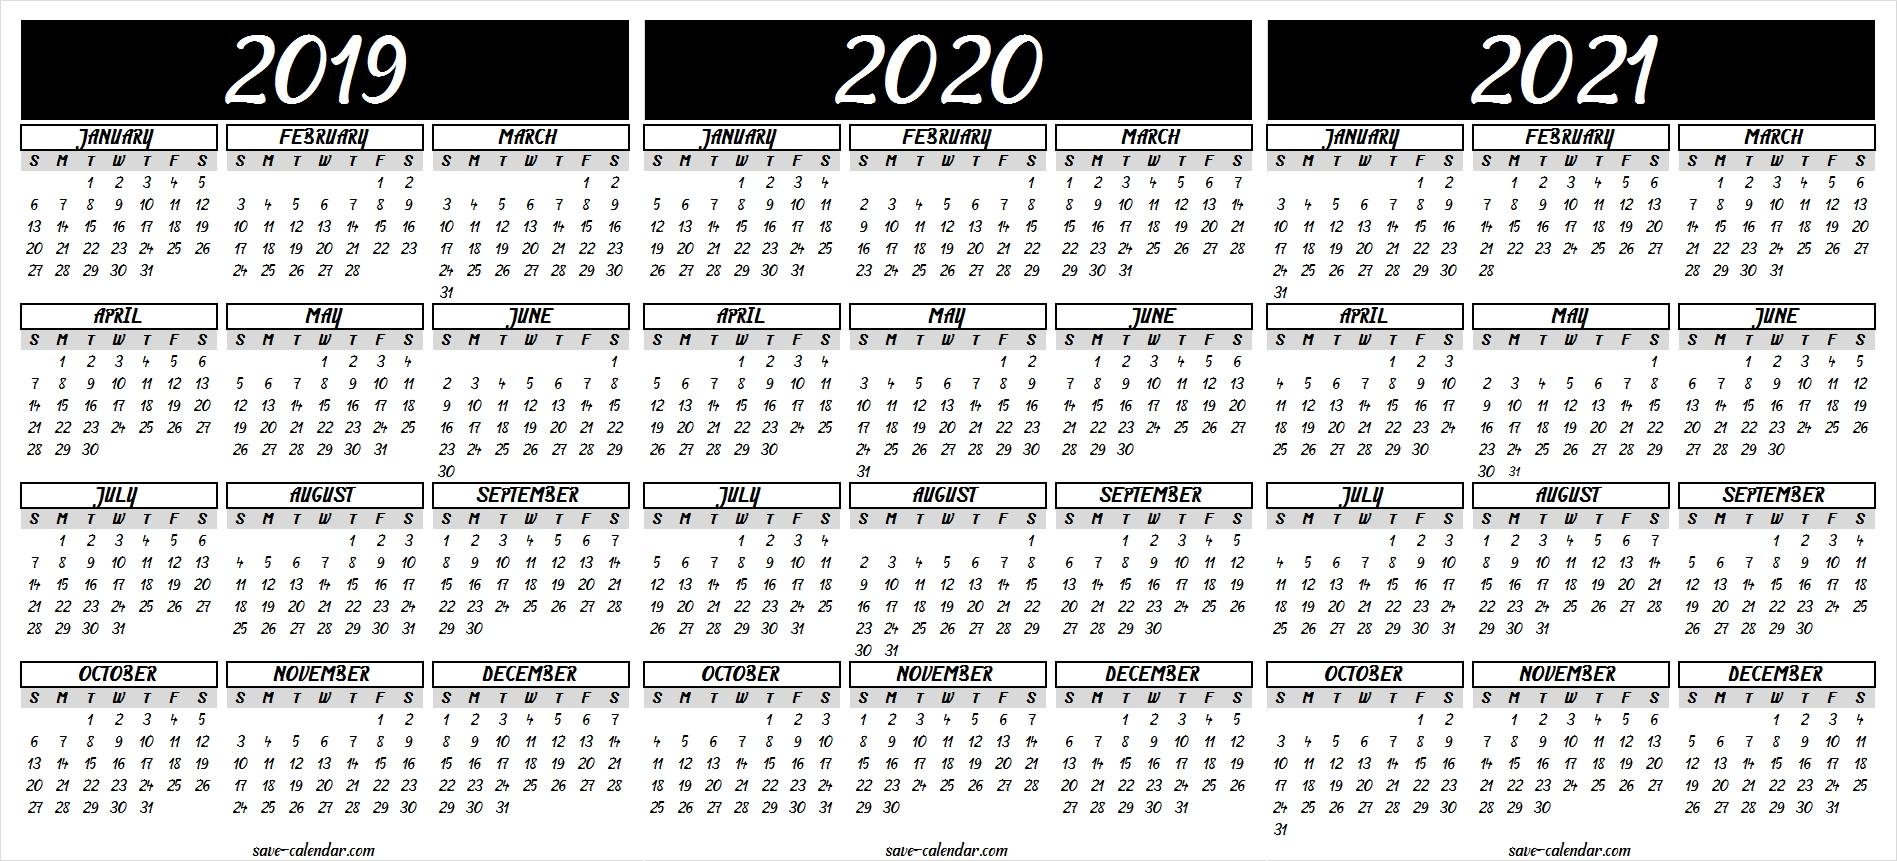 2019 2020 2021 Calendar Printable   Calendar Printables within 3 Year Calendar 2019 2020 2021 Printable